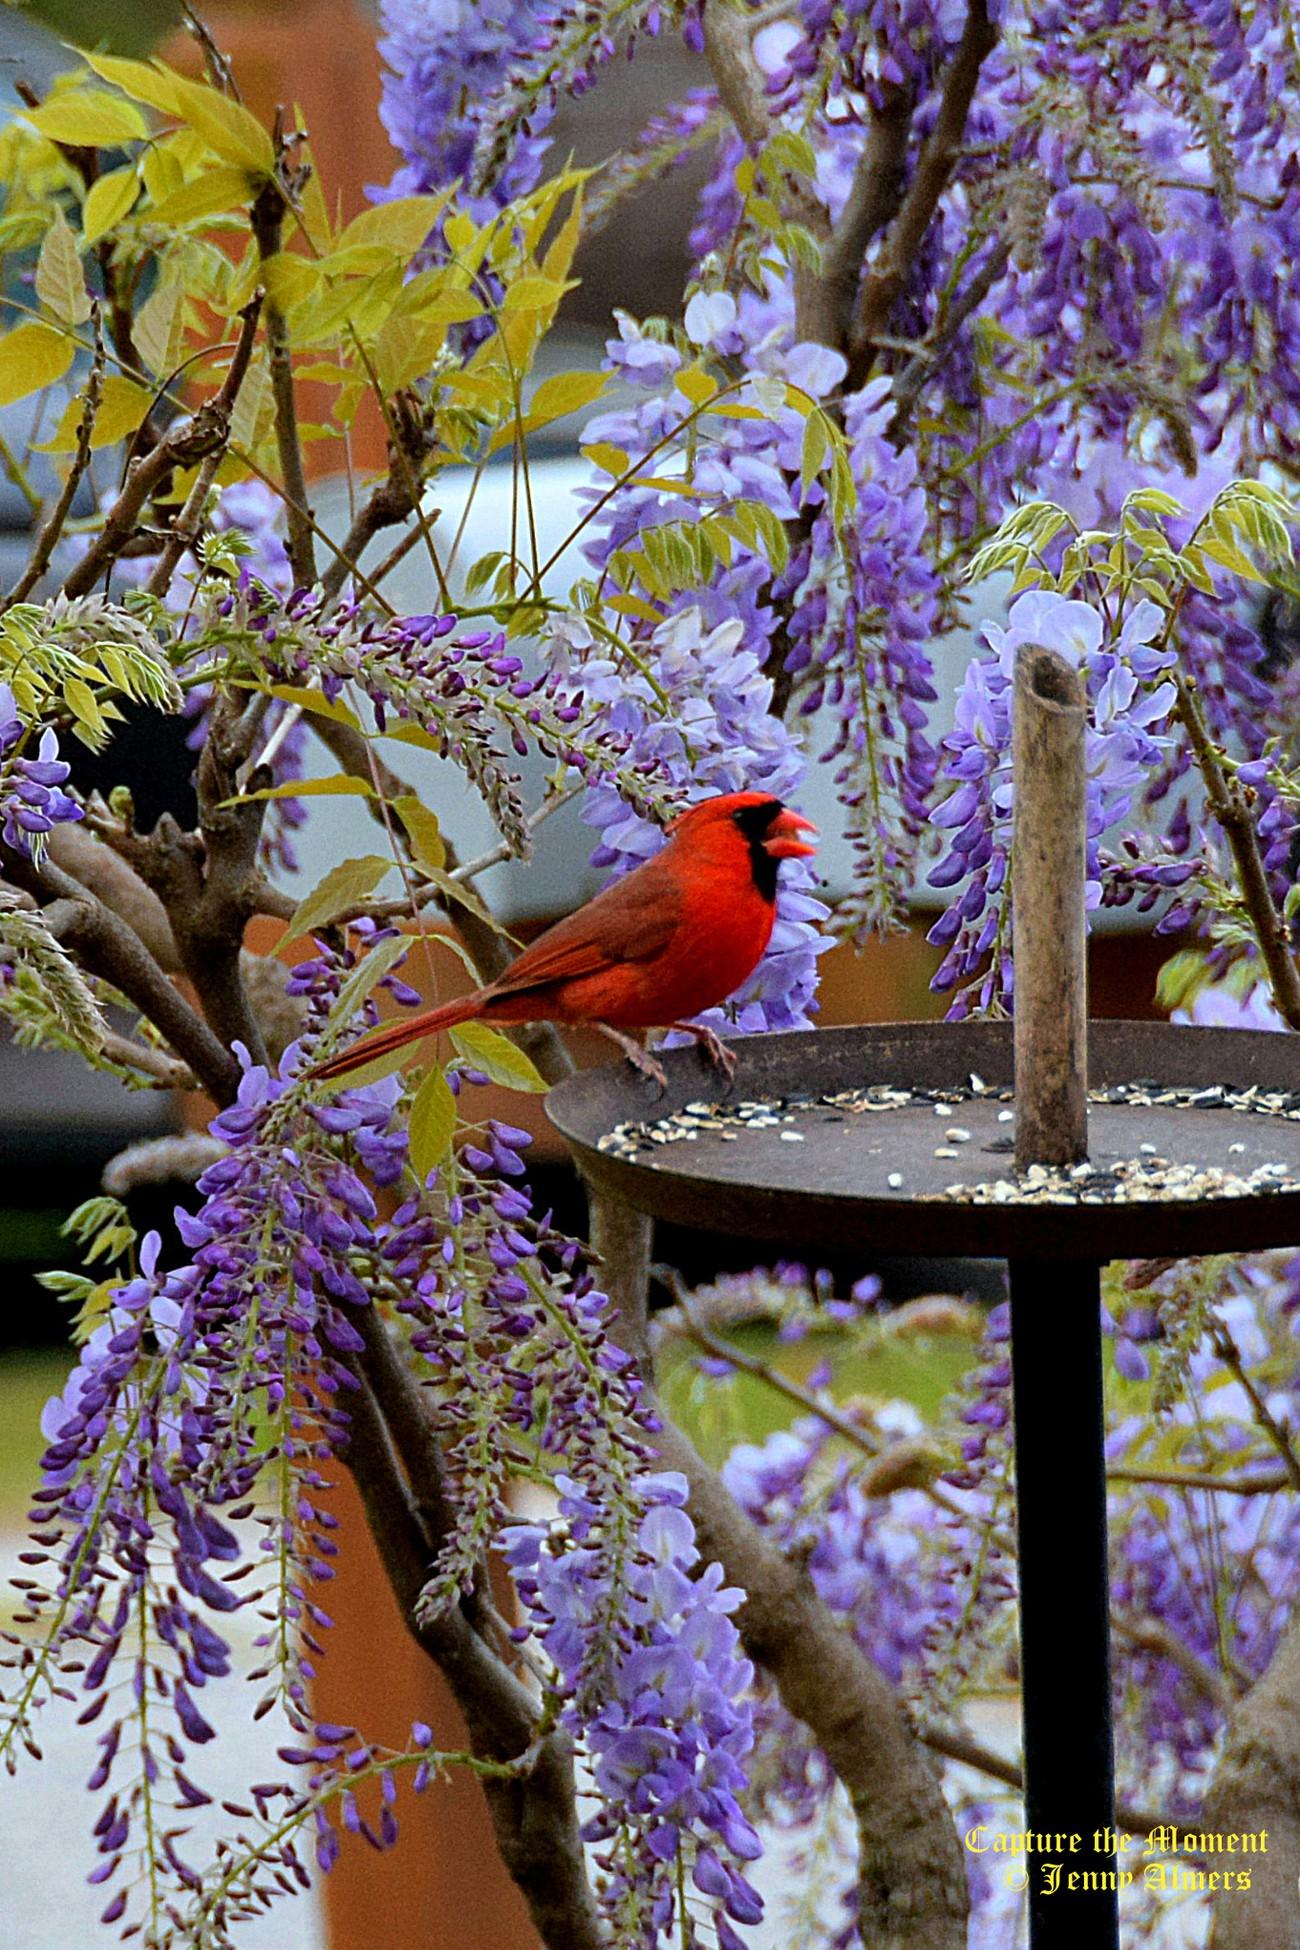 Cardinal and Wisteria